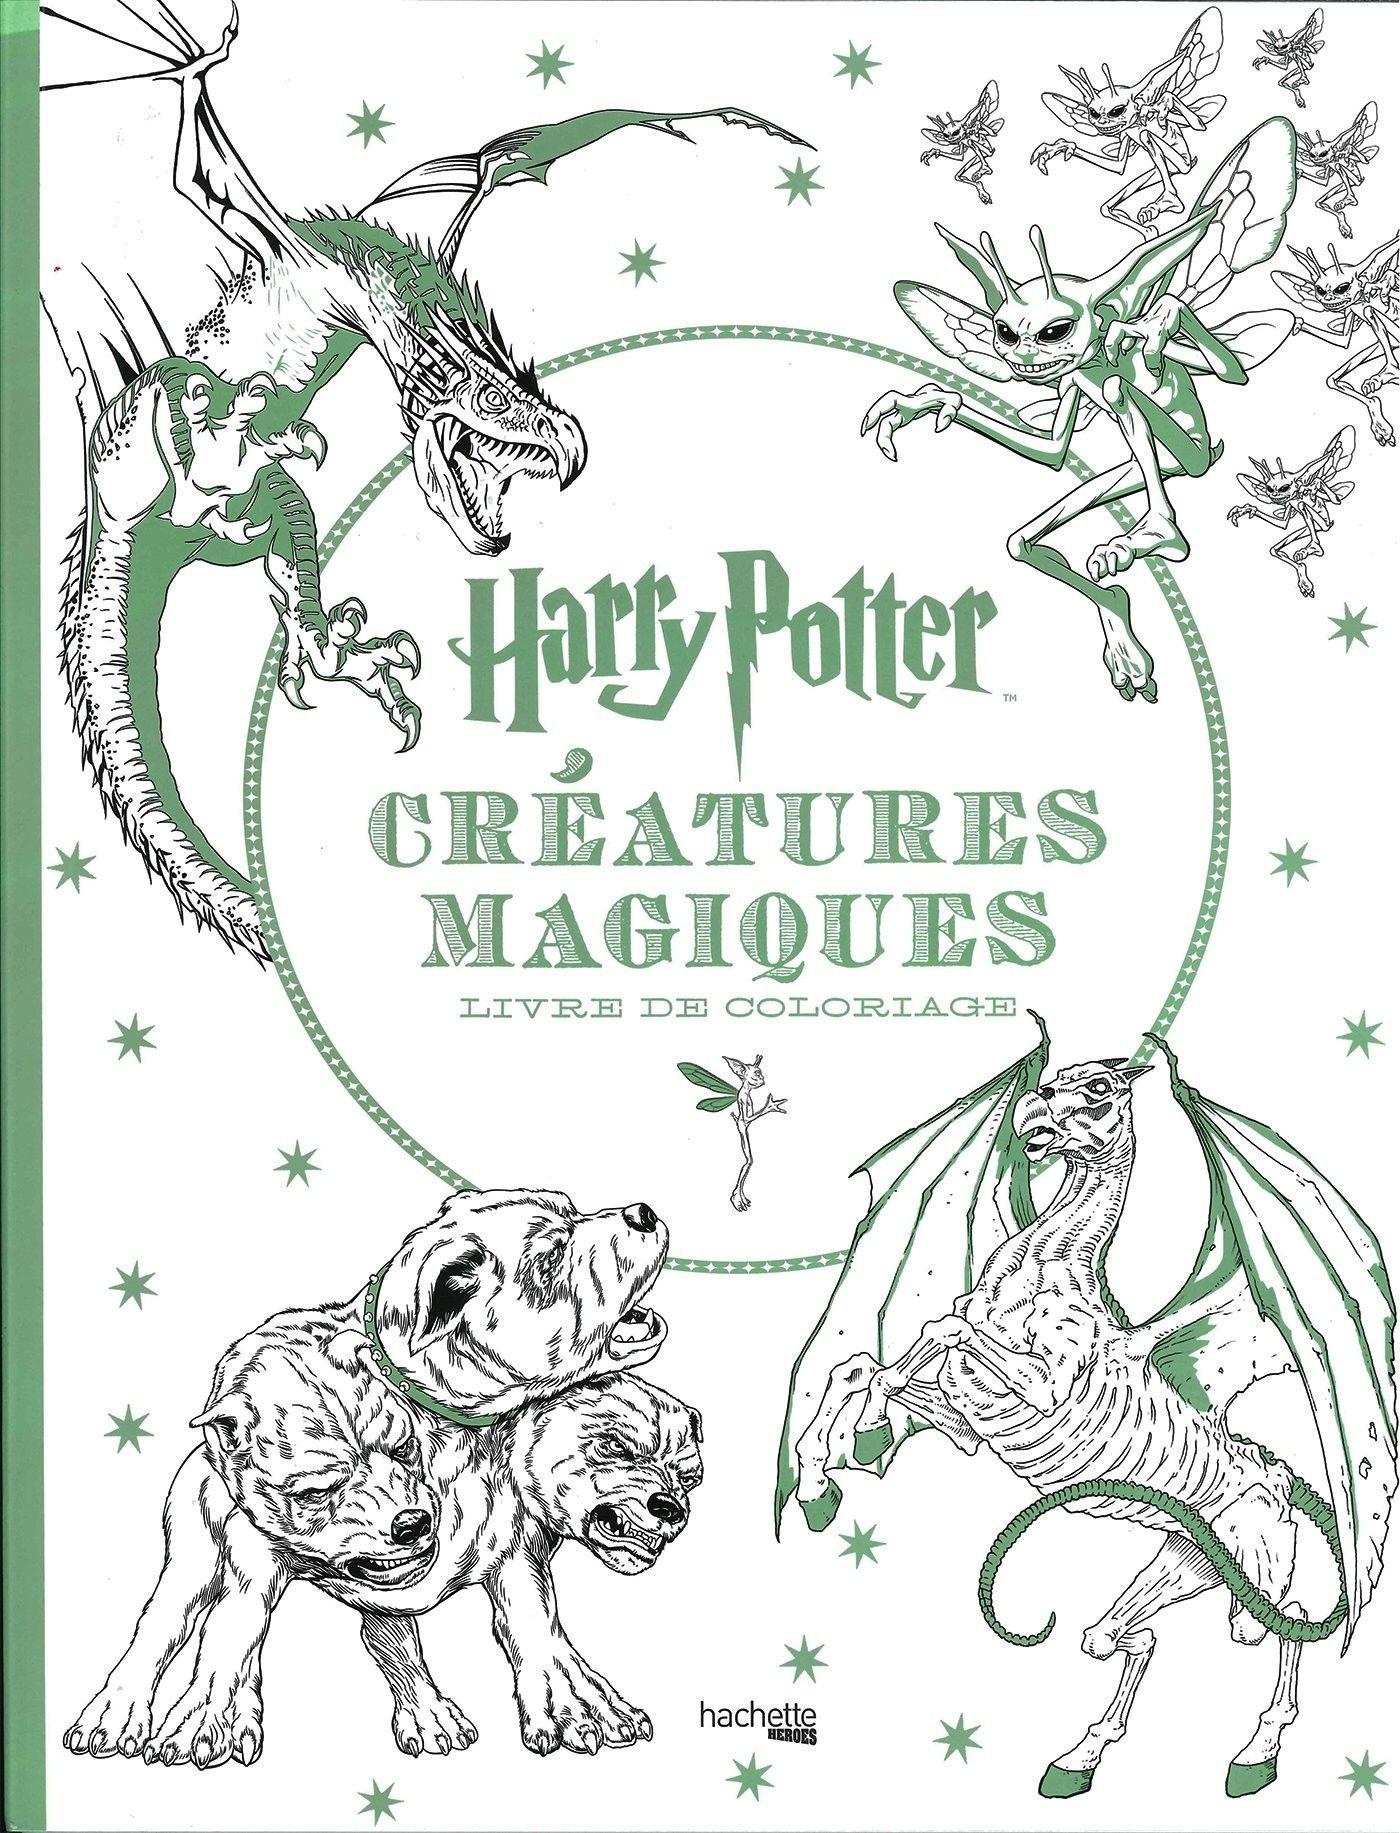 Harry Potter Creatures Magiques Coloriage Boor